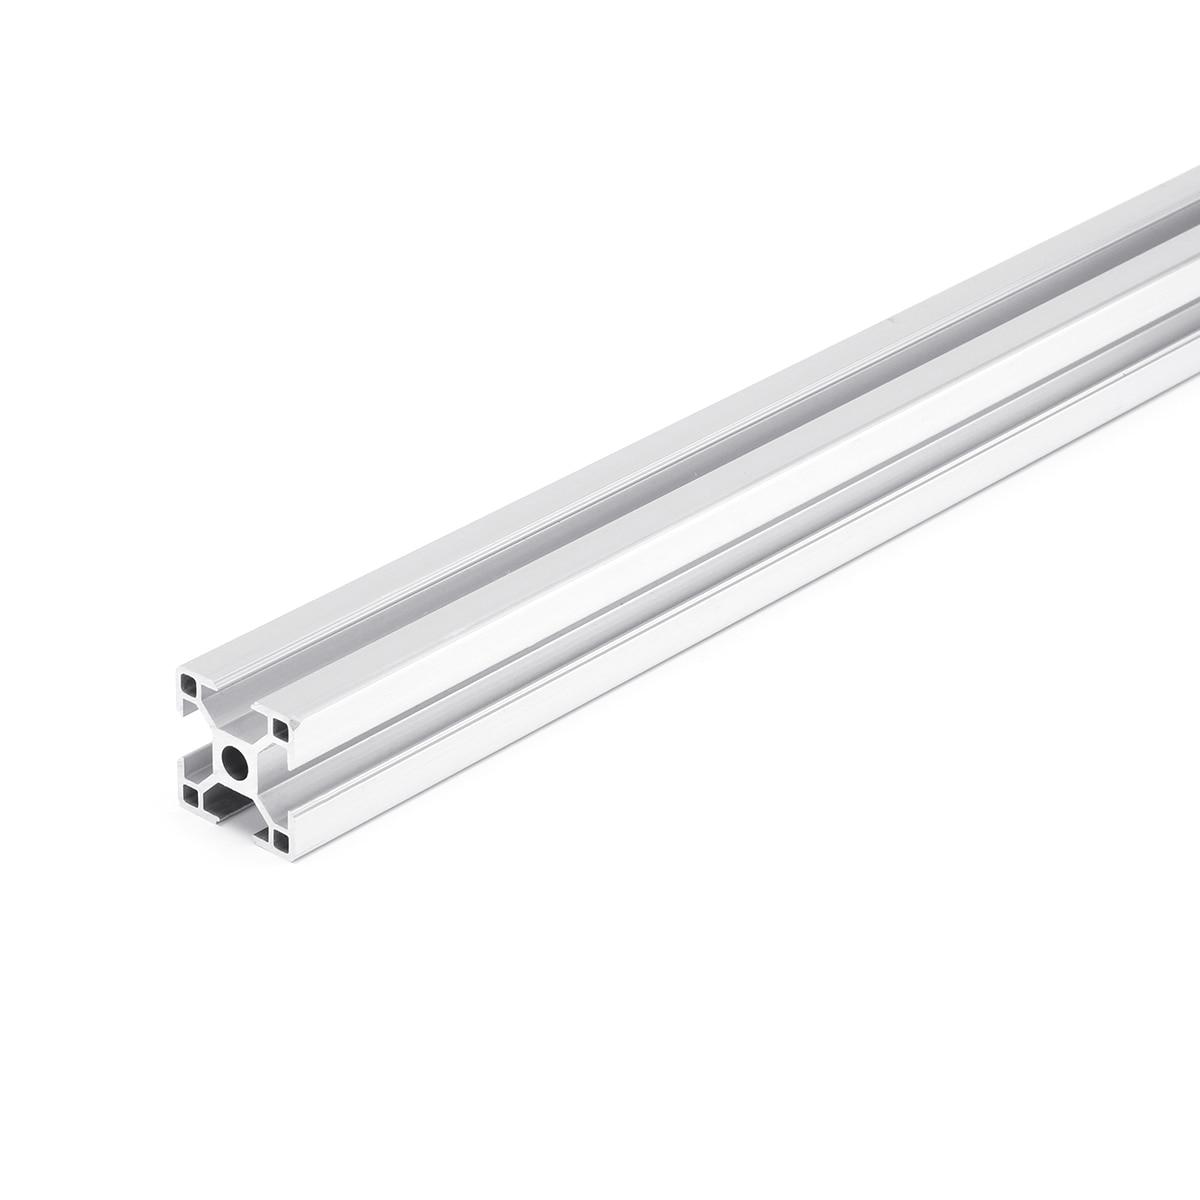 1000mm Sliver 3030 T Slot Aluminium Profiel Extrusie Frame Voor Stands Meubels 3d Printer Laser